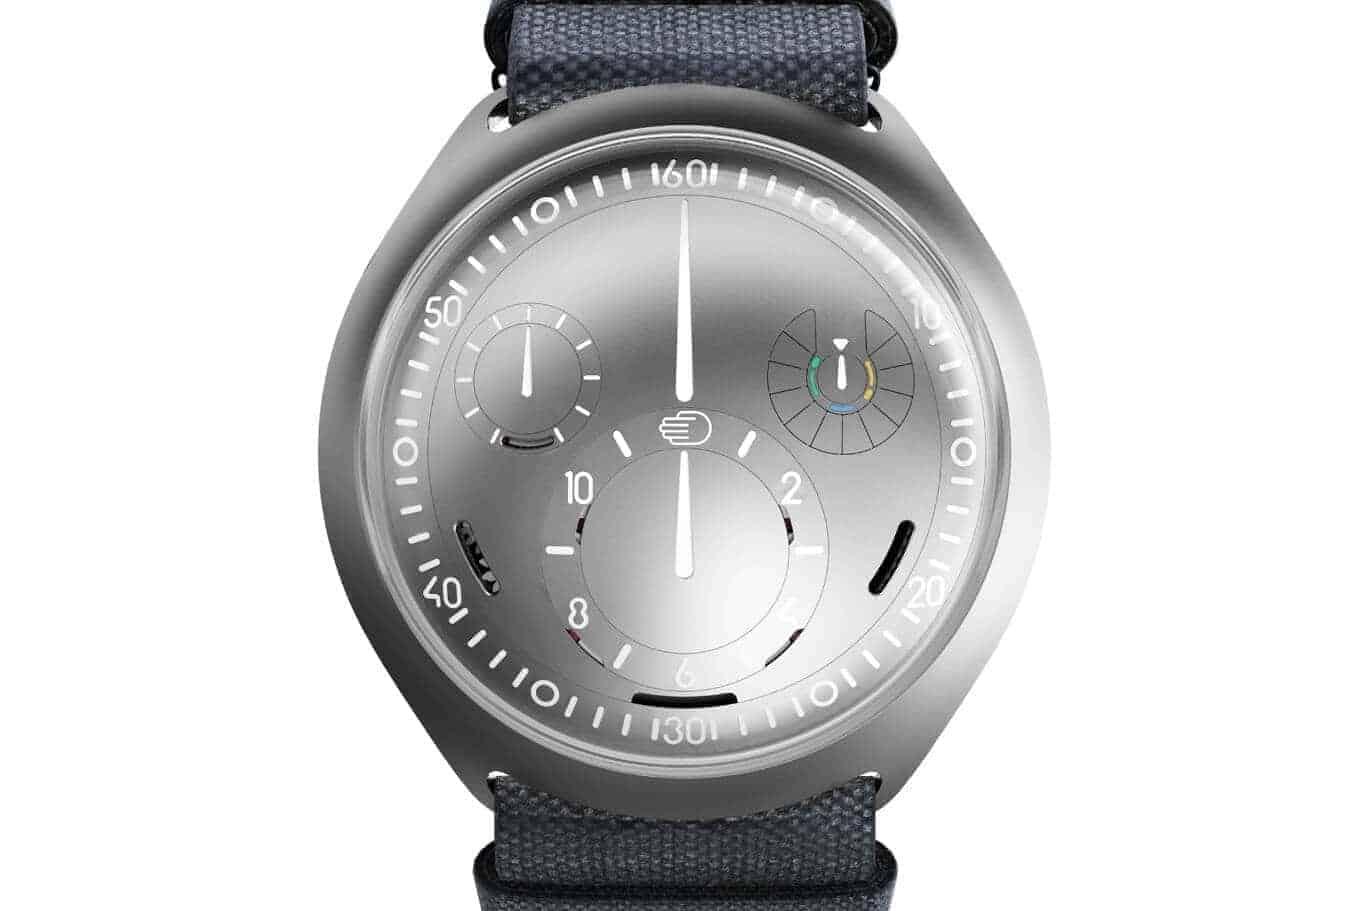 ressence Type 2 e Crown Concept smartwatch concept image 06